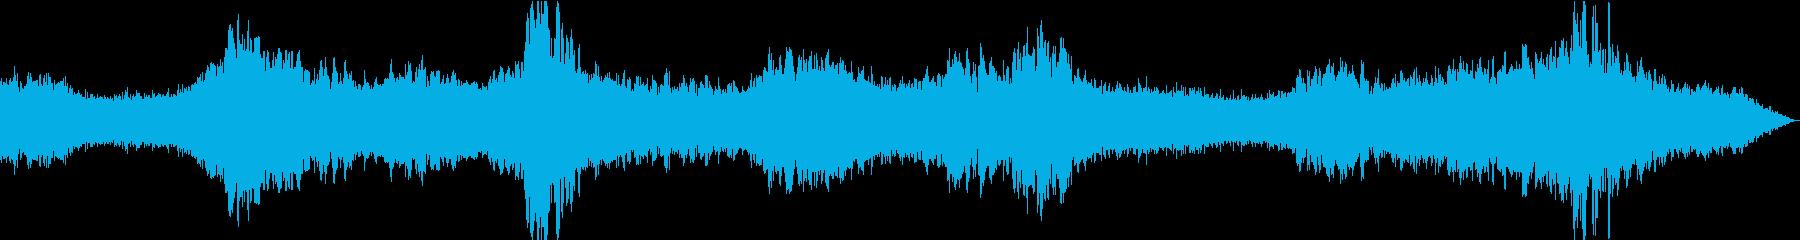 PADS ブレストゥブレス01の再生済みの波形